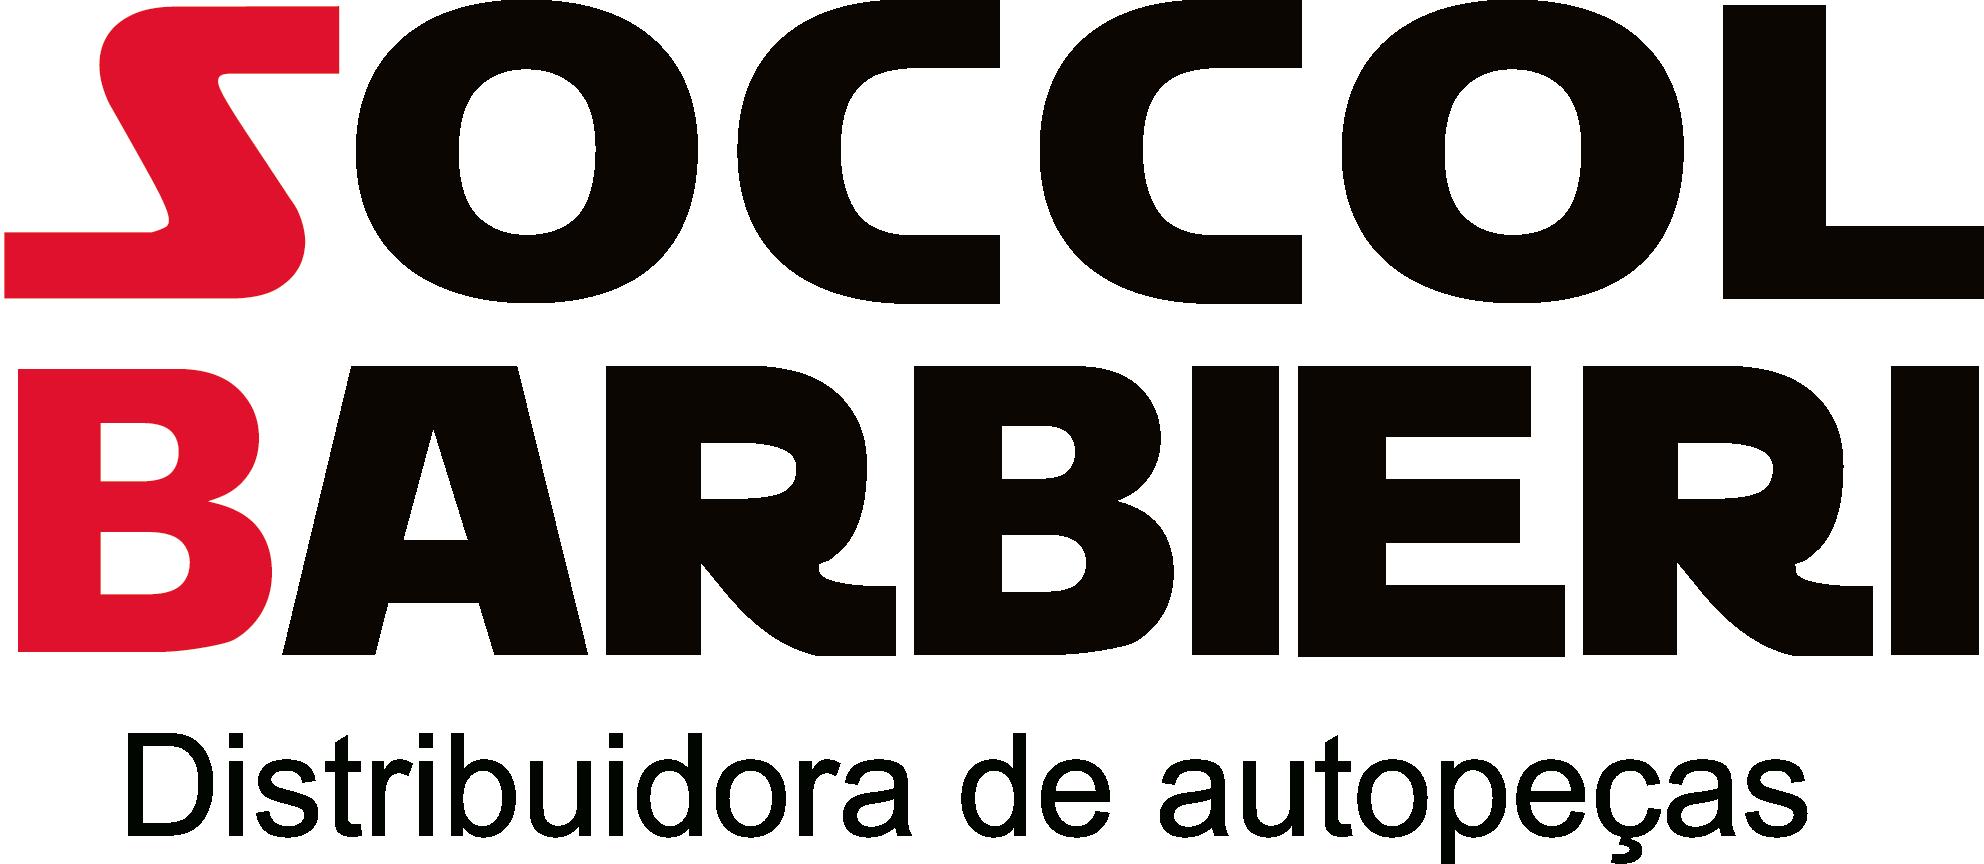 Soccol Barbieri